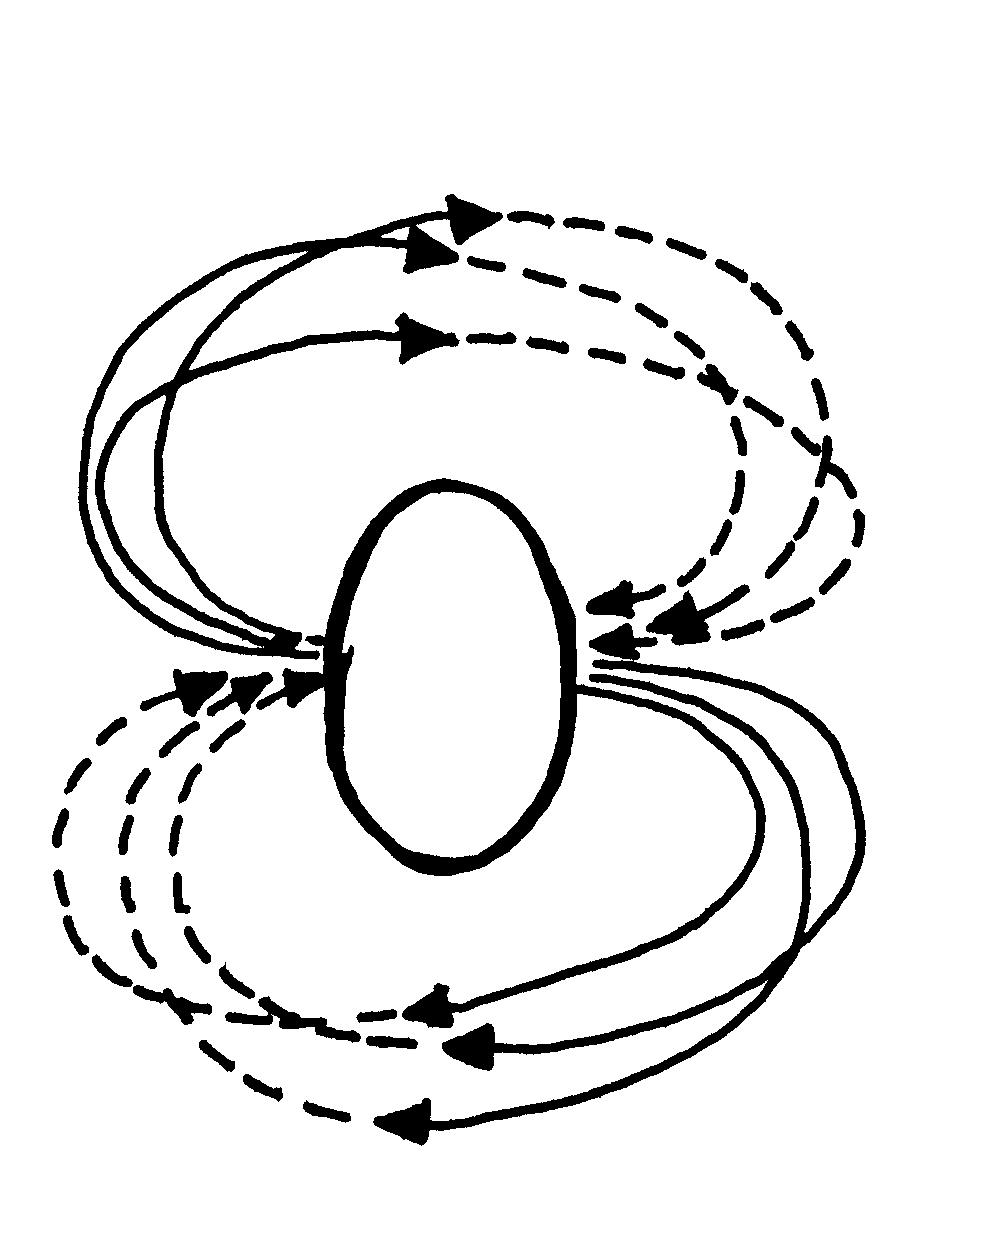 Conceptual Circulation Diagram